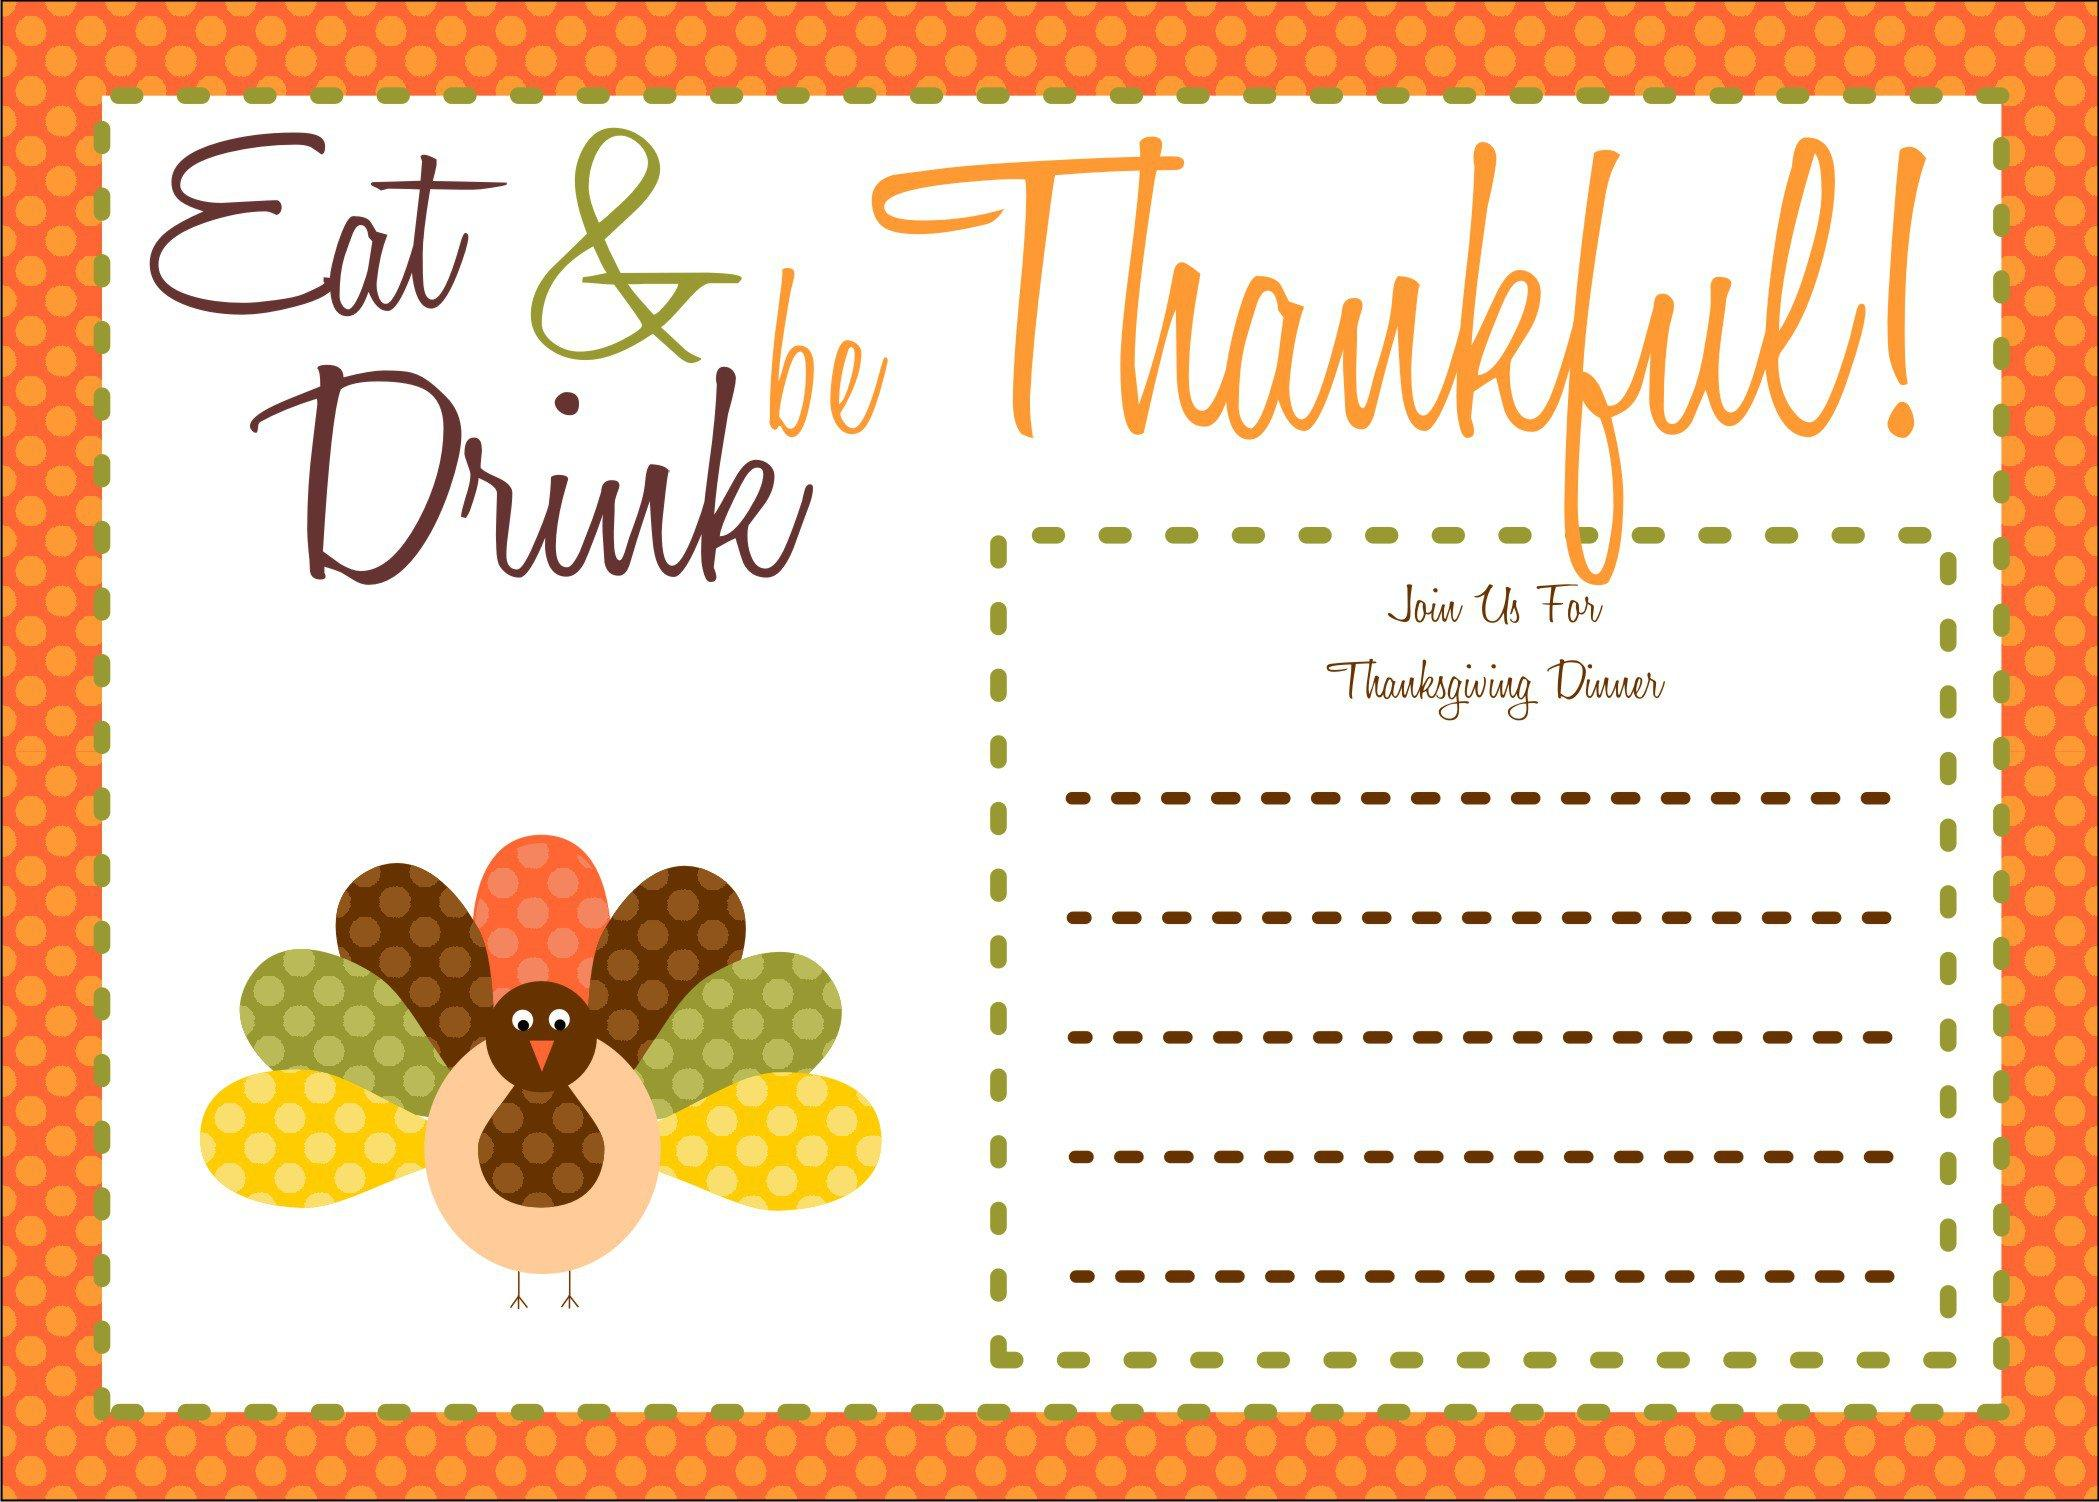 Free Printable Thanksgiving Dinner Invitation Templates